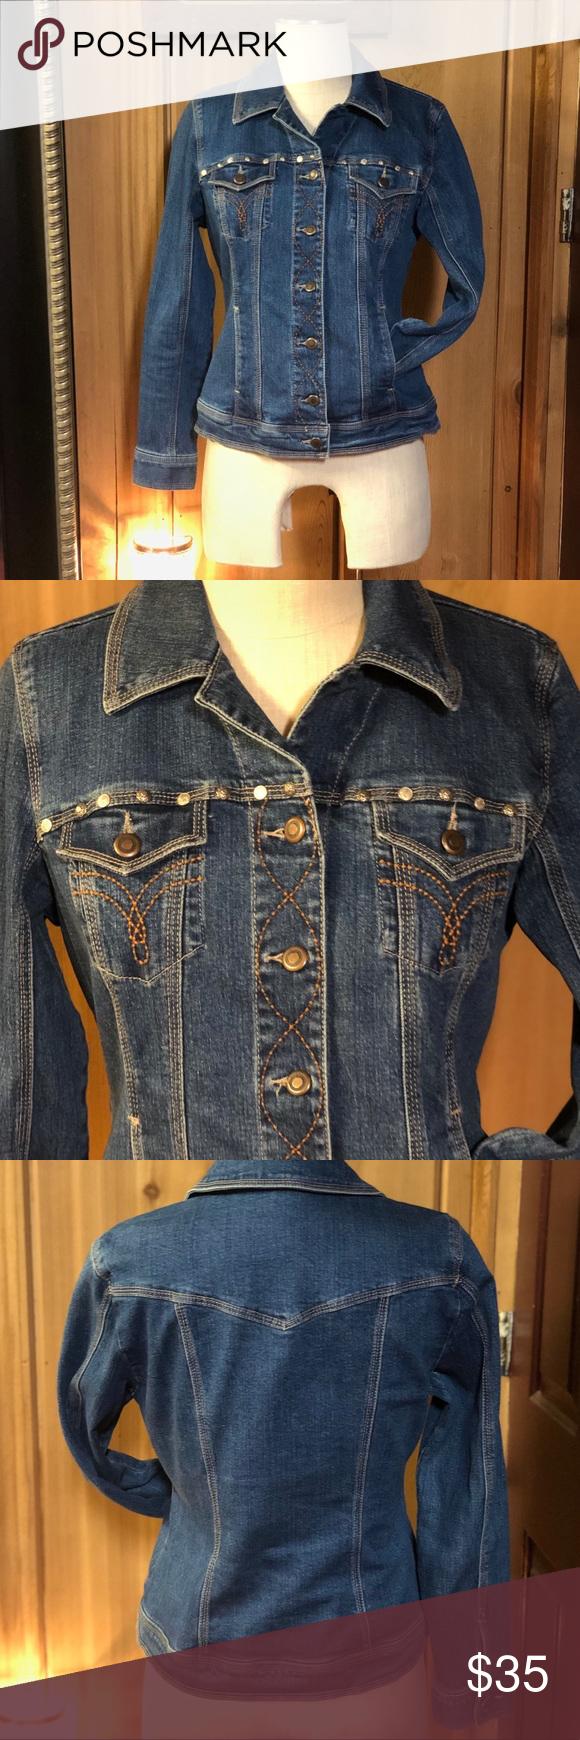 5aea79679f8 Dress Barn Jean Jacket Unique Stitches and Studs super Fashionable Jacket  Jackets & Coats Jean Jackets